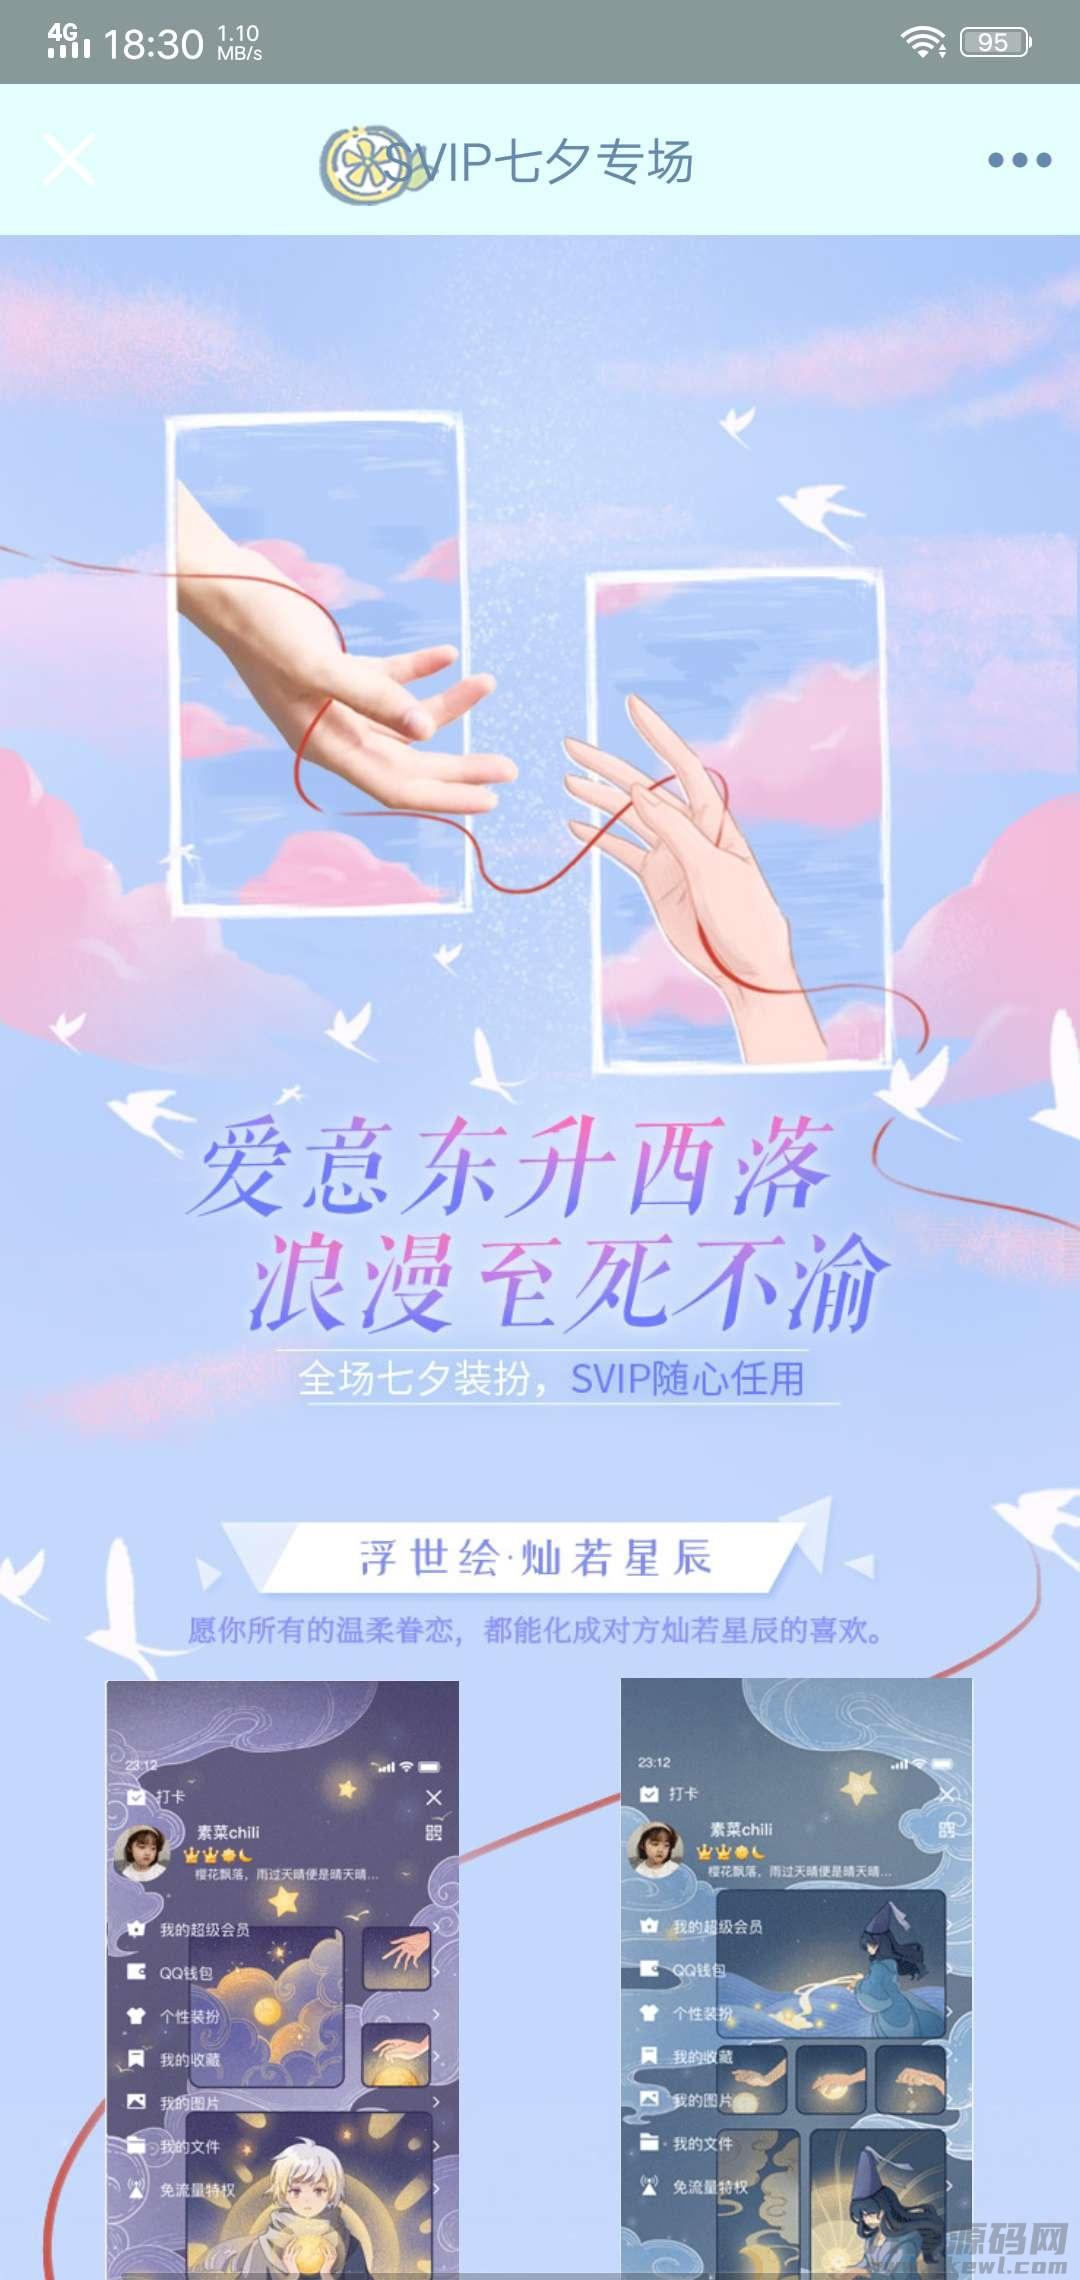 QQ超会免费领七夕装扮插图